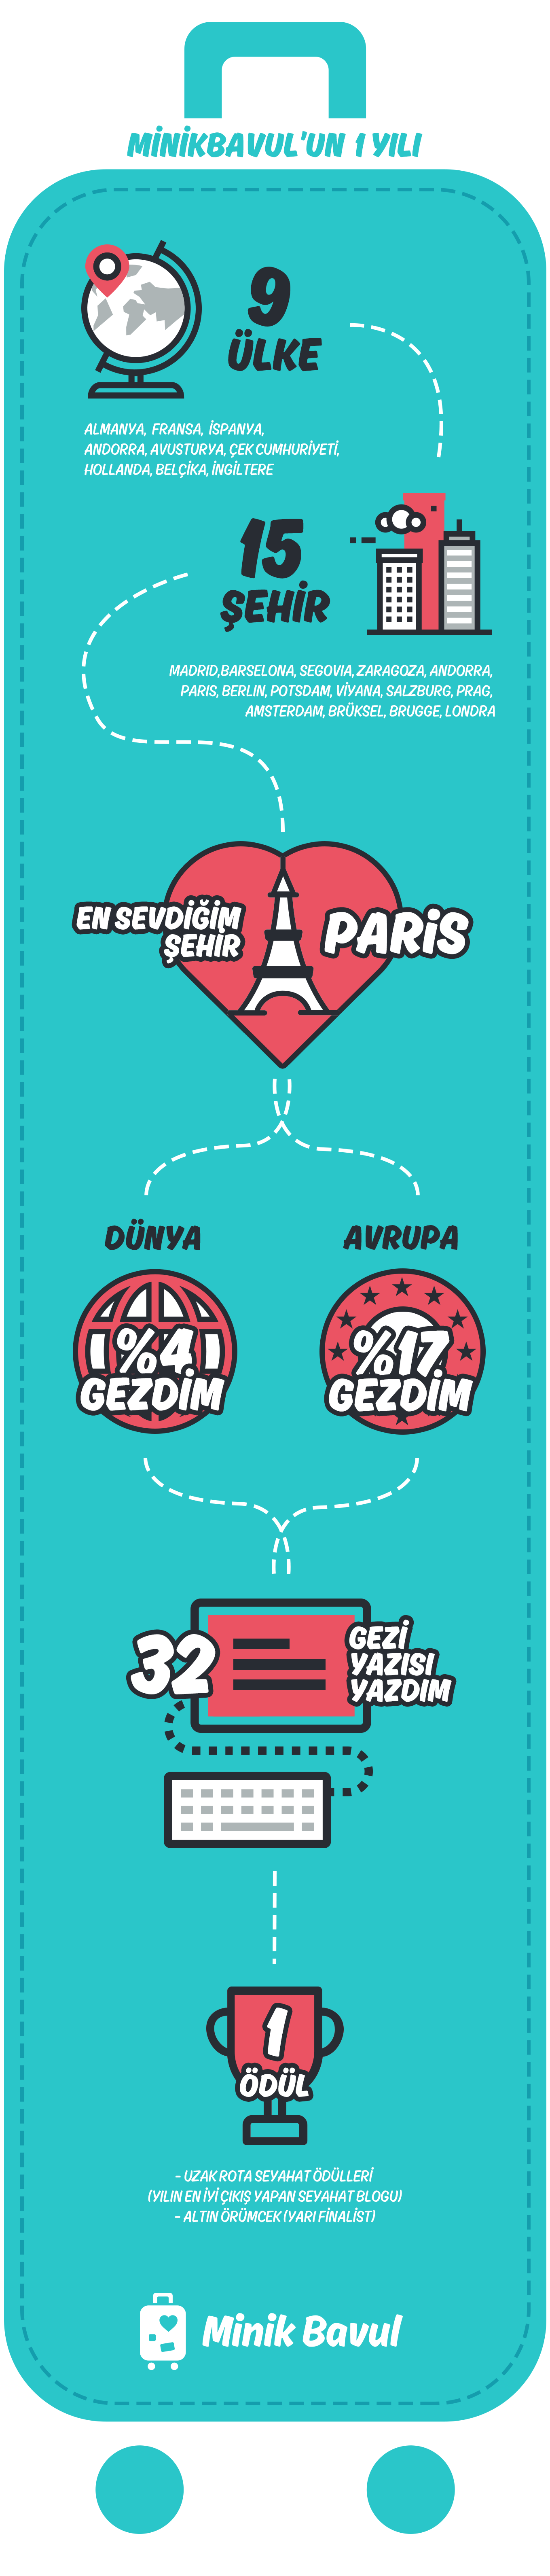 minikbavul_infografik